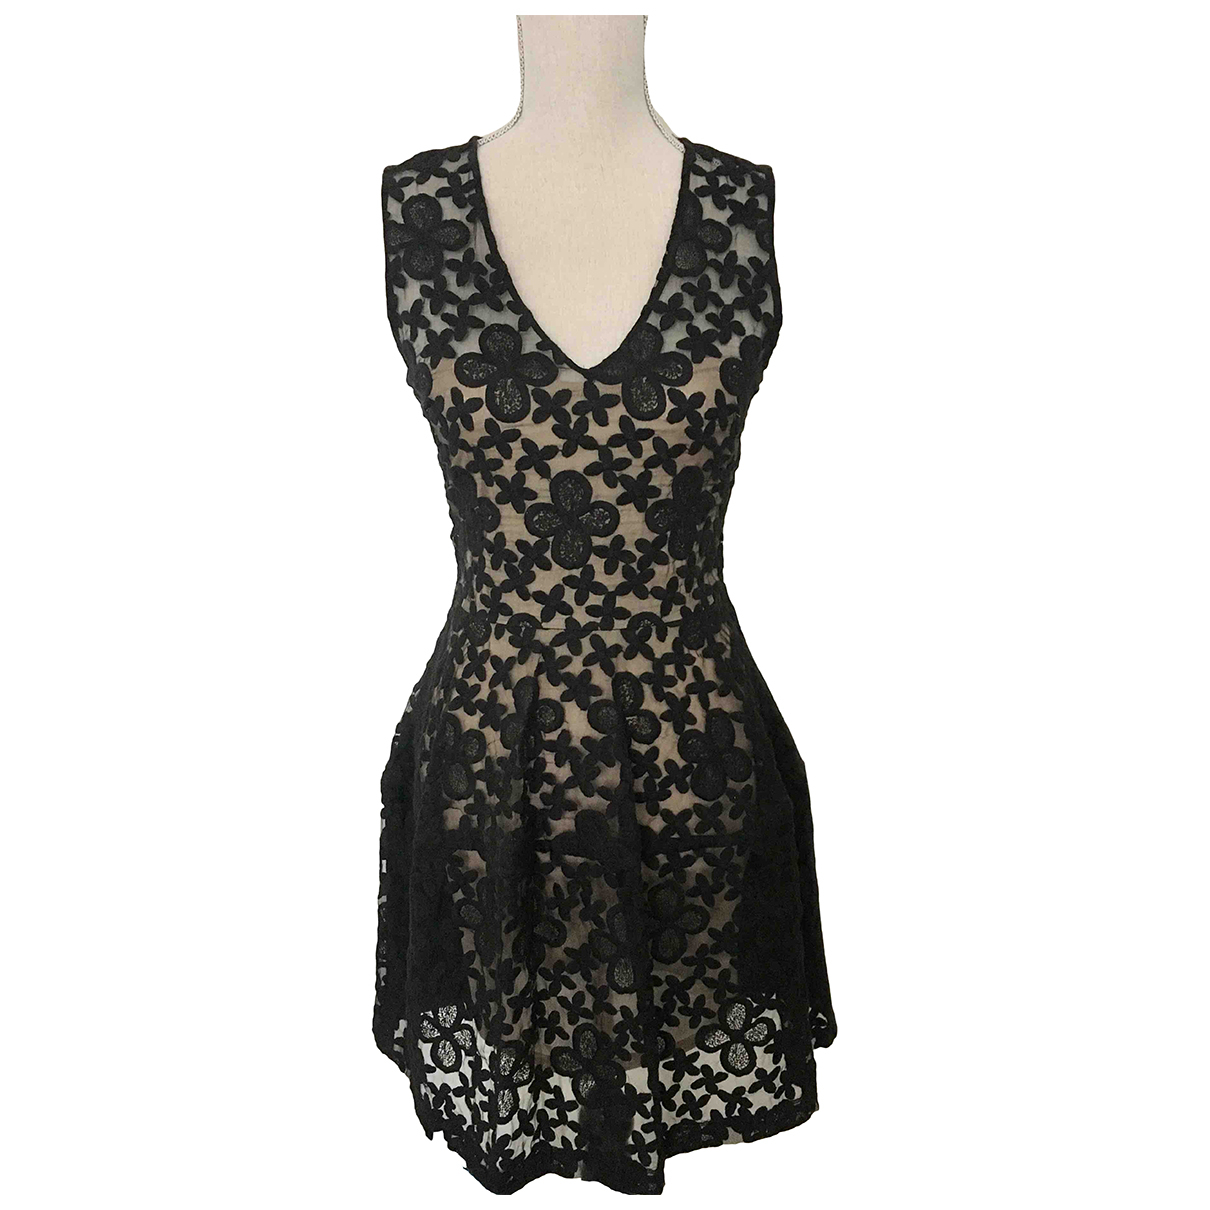 Maje N Black dress for Women 36 FR